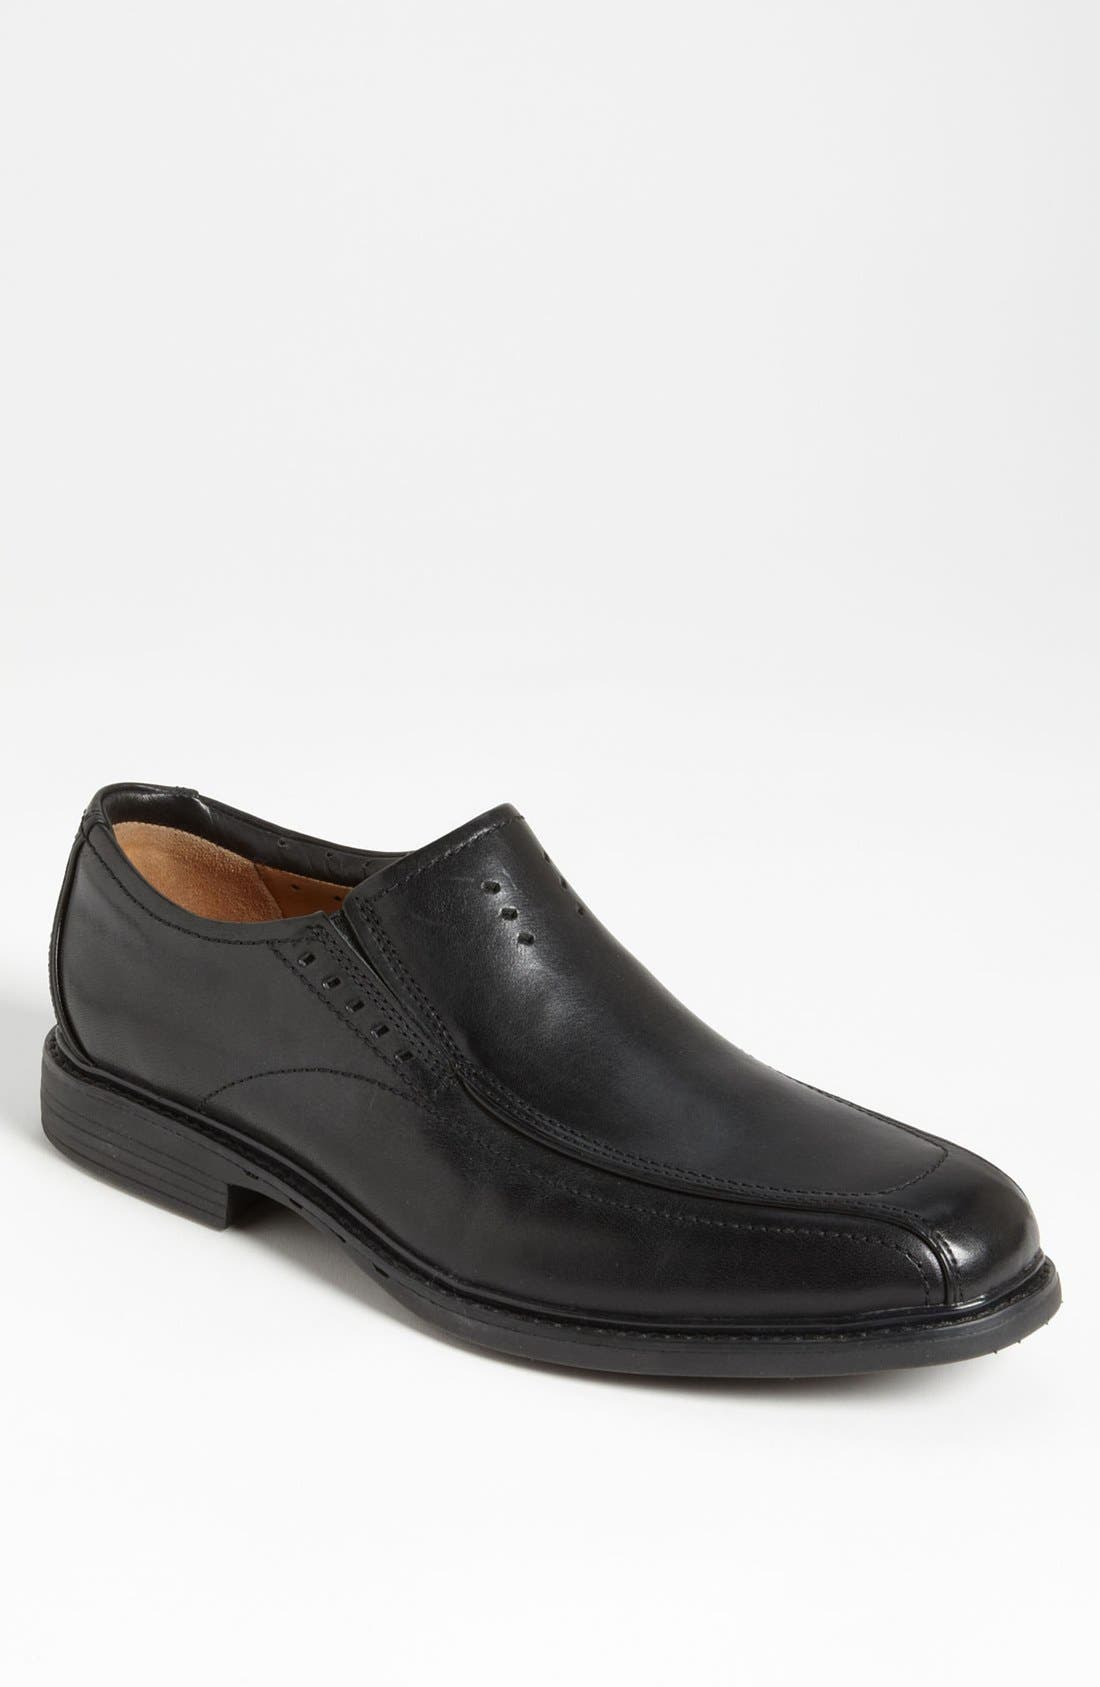 Alternate Image 1 Selected - Clarks® 'Un.Anders' Venetian Loafer   (Men)